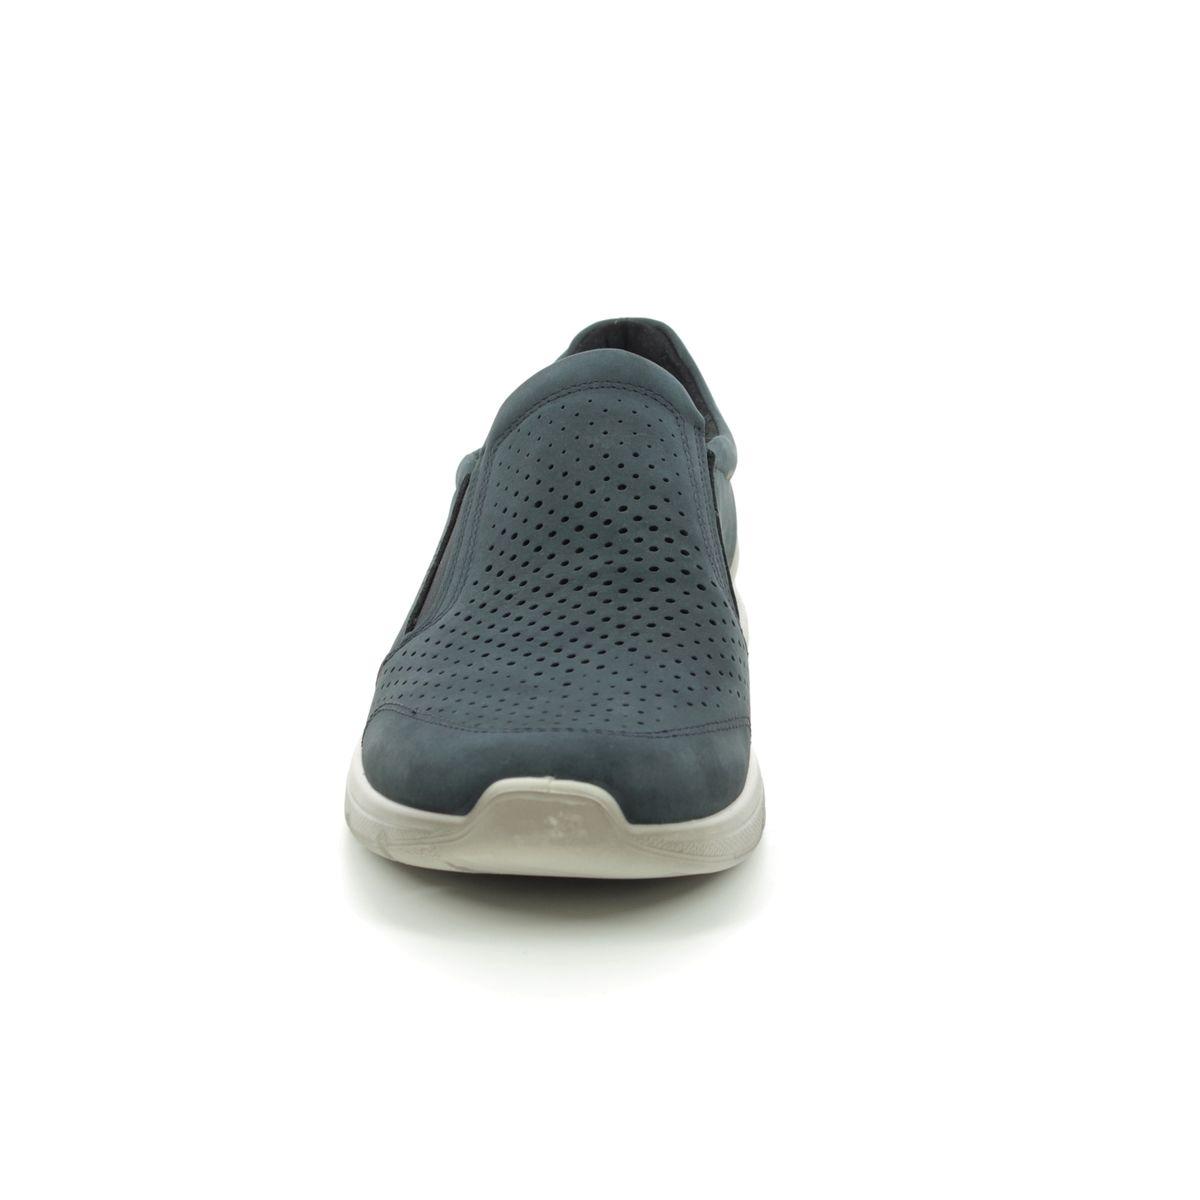 7ec8085643c ECCO Casual Shoes - Navy nubuck - 511644 02058 IRVING SLIP-ON